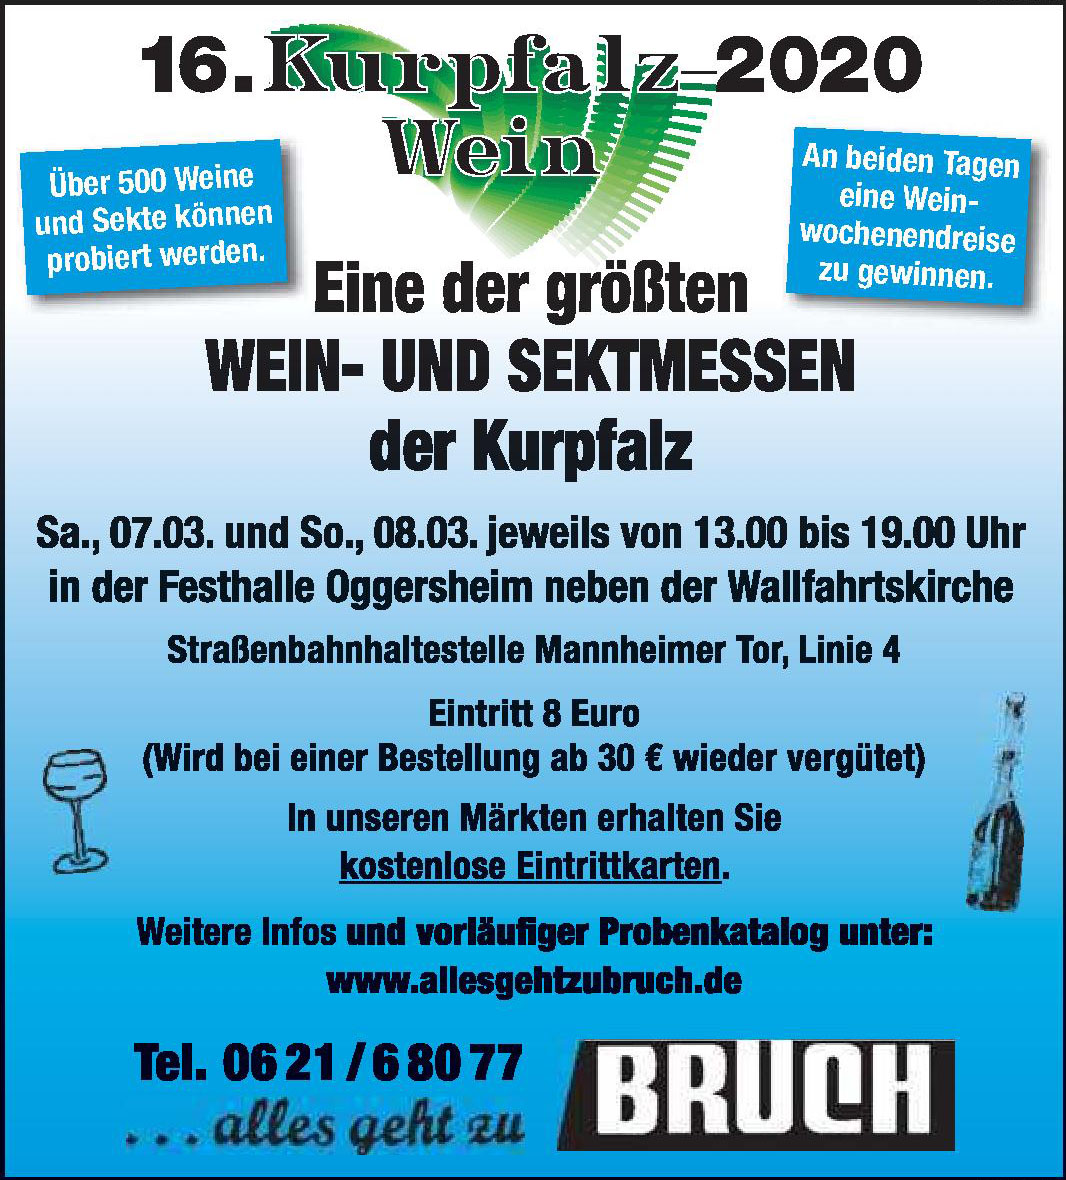 16. Kurpfalz 2020 Wein